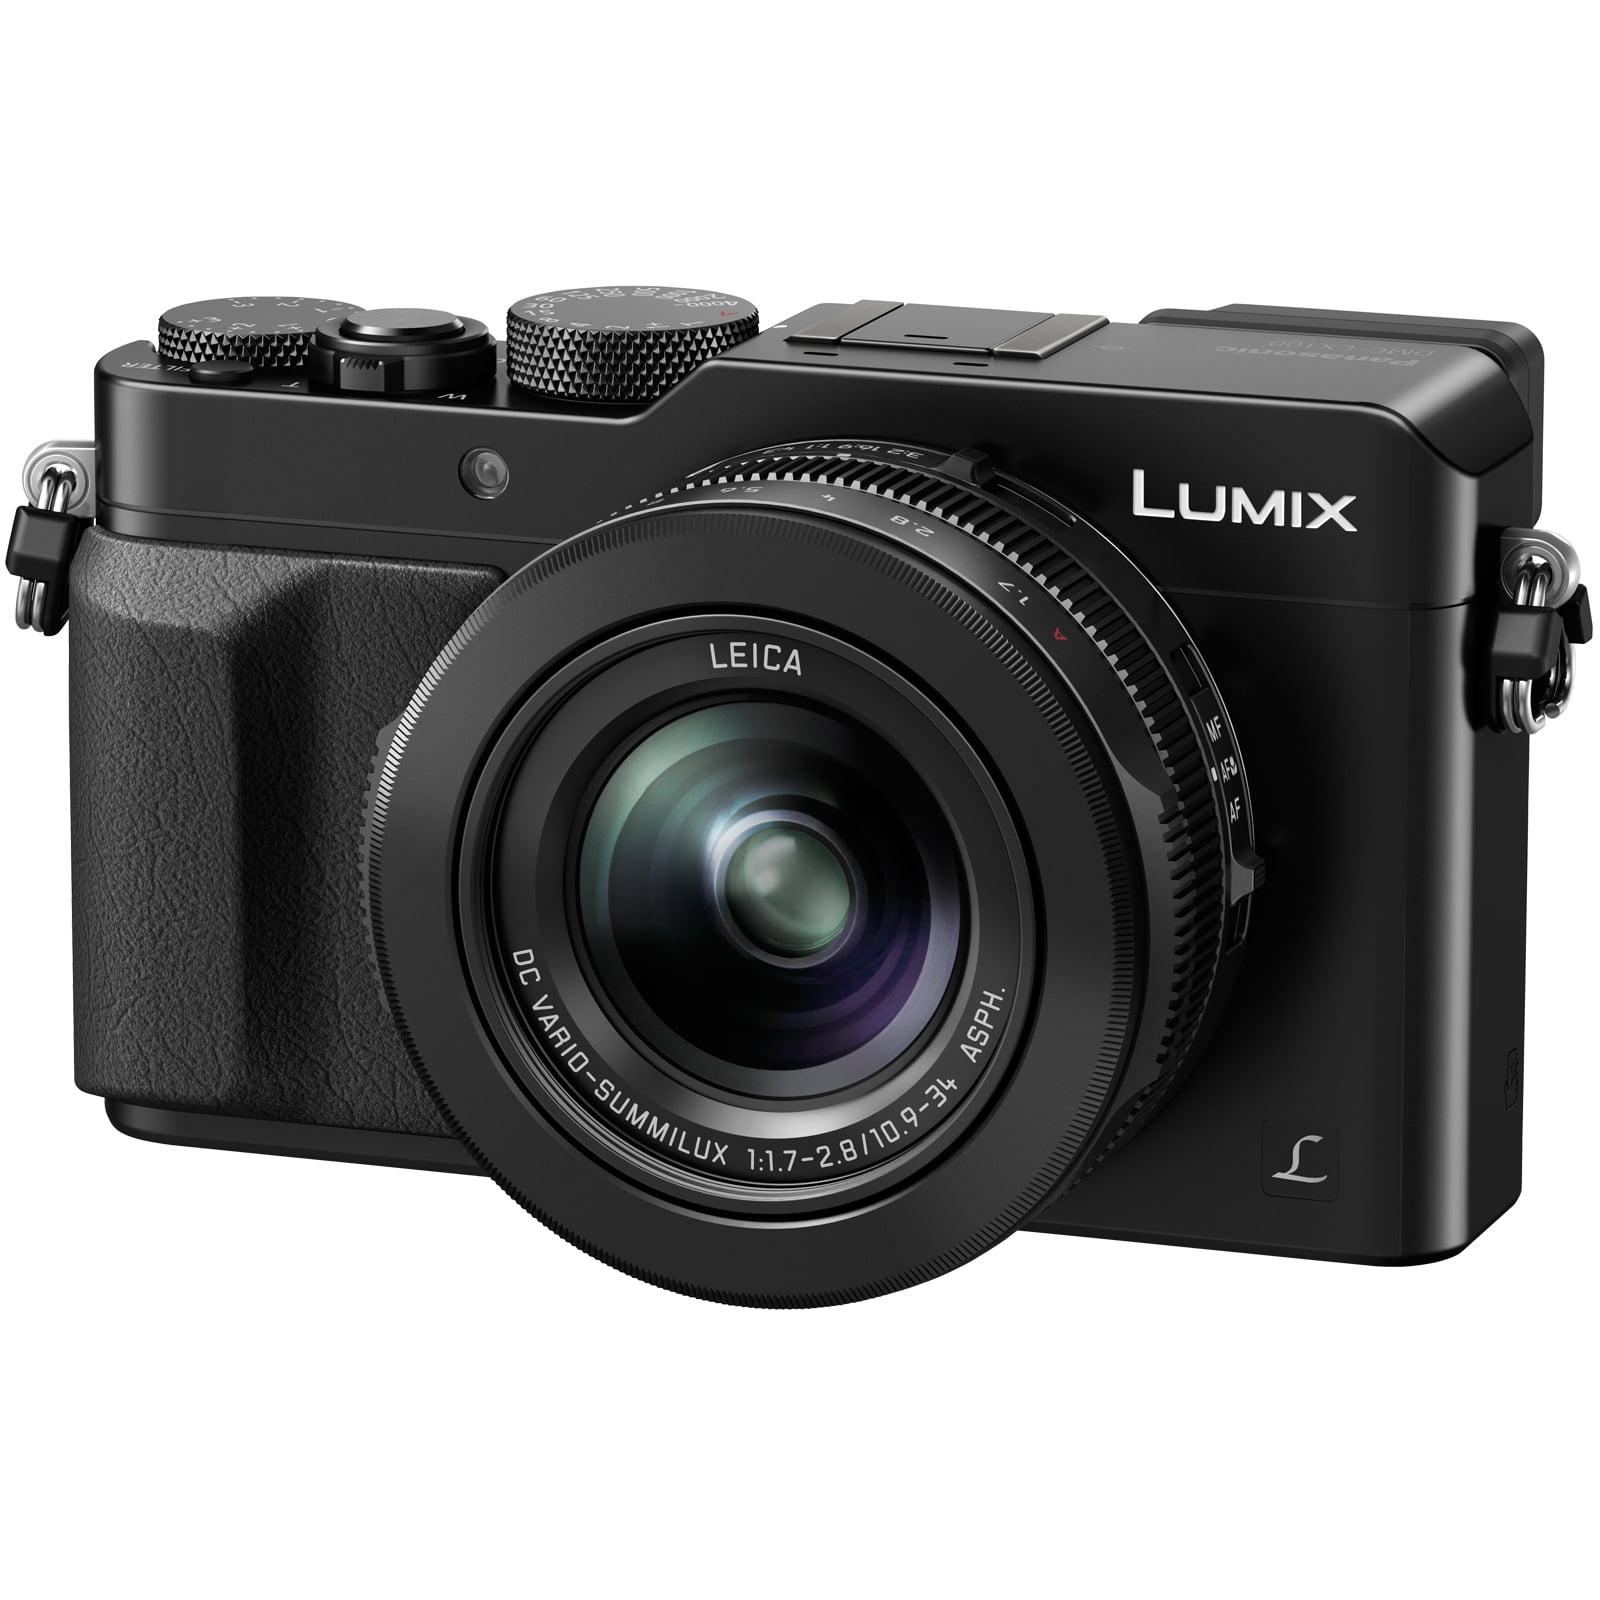 Panasonic Lumix DMC-LX100K Digital Camera, Black by Panasonic